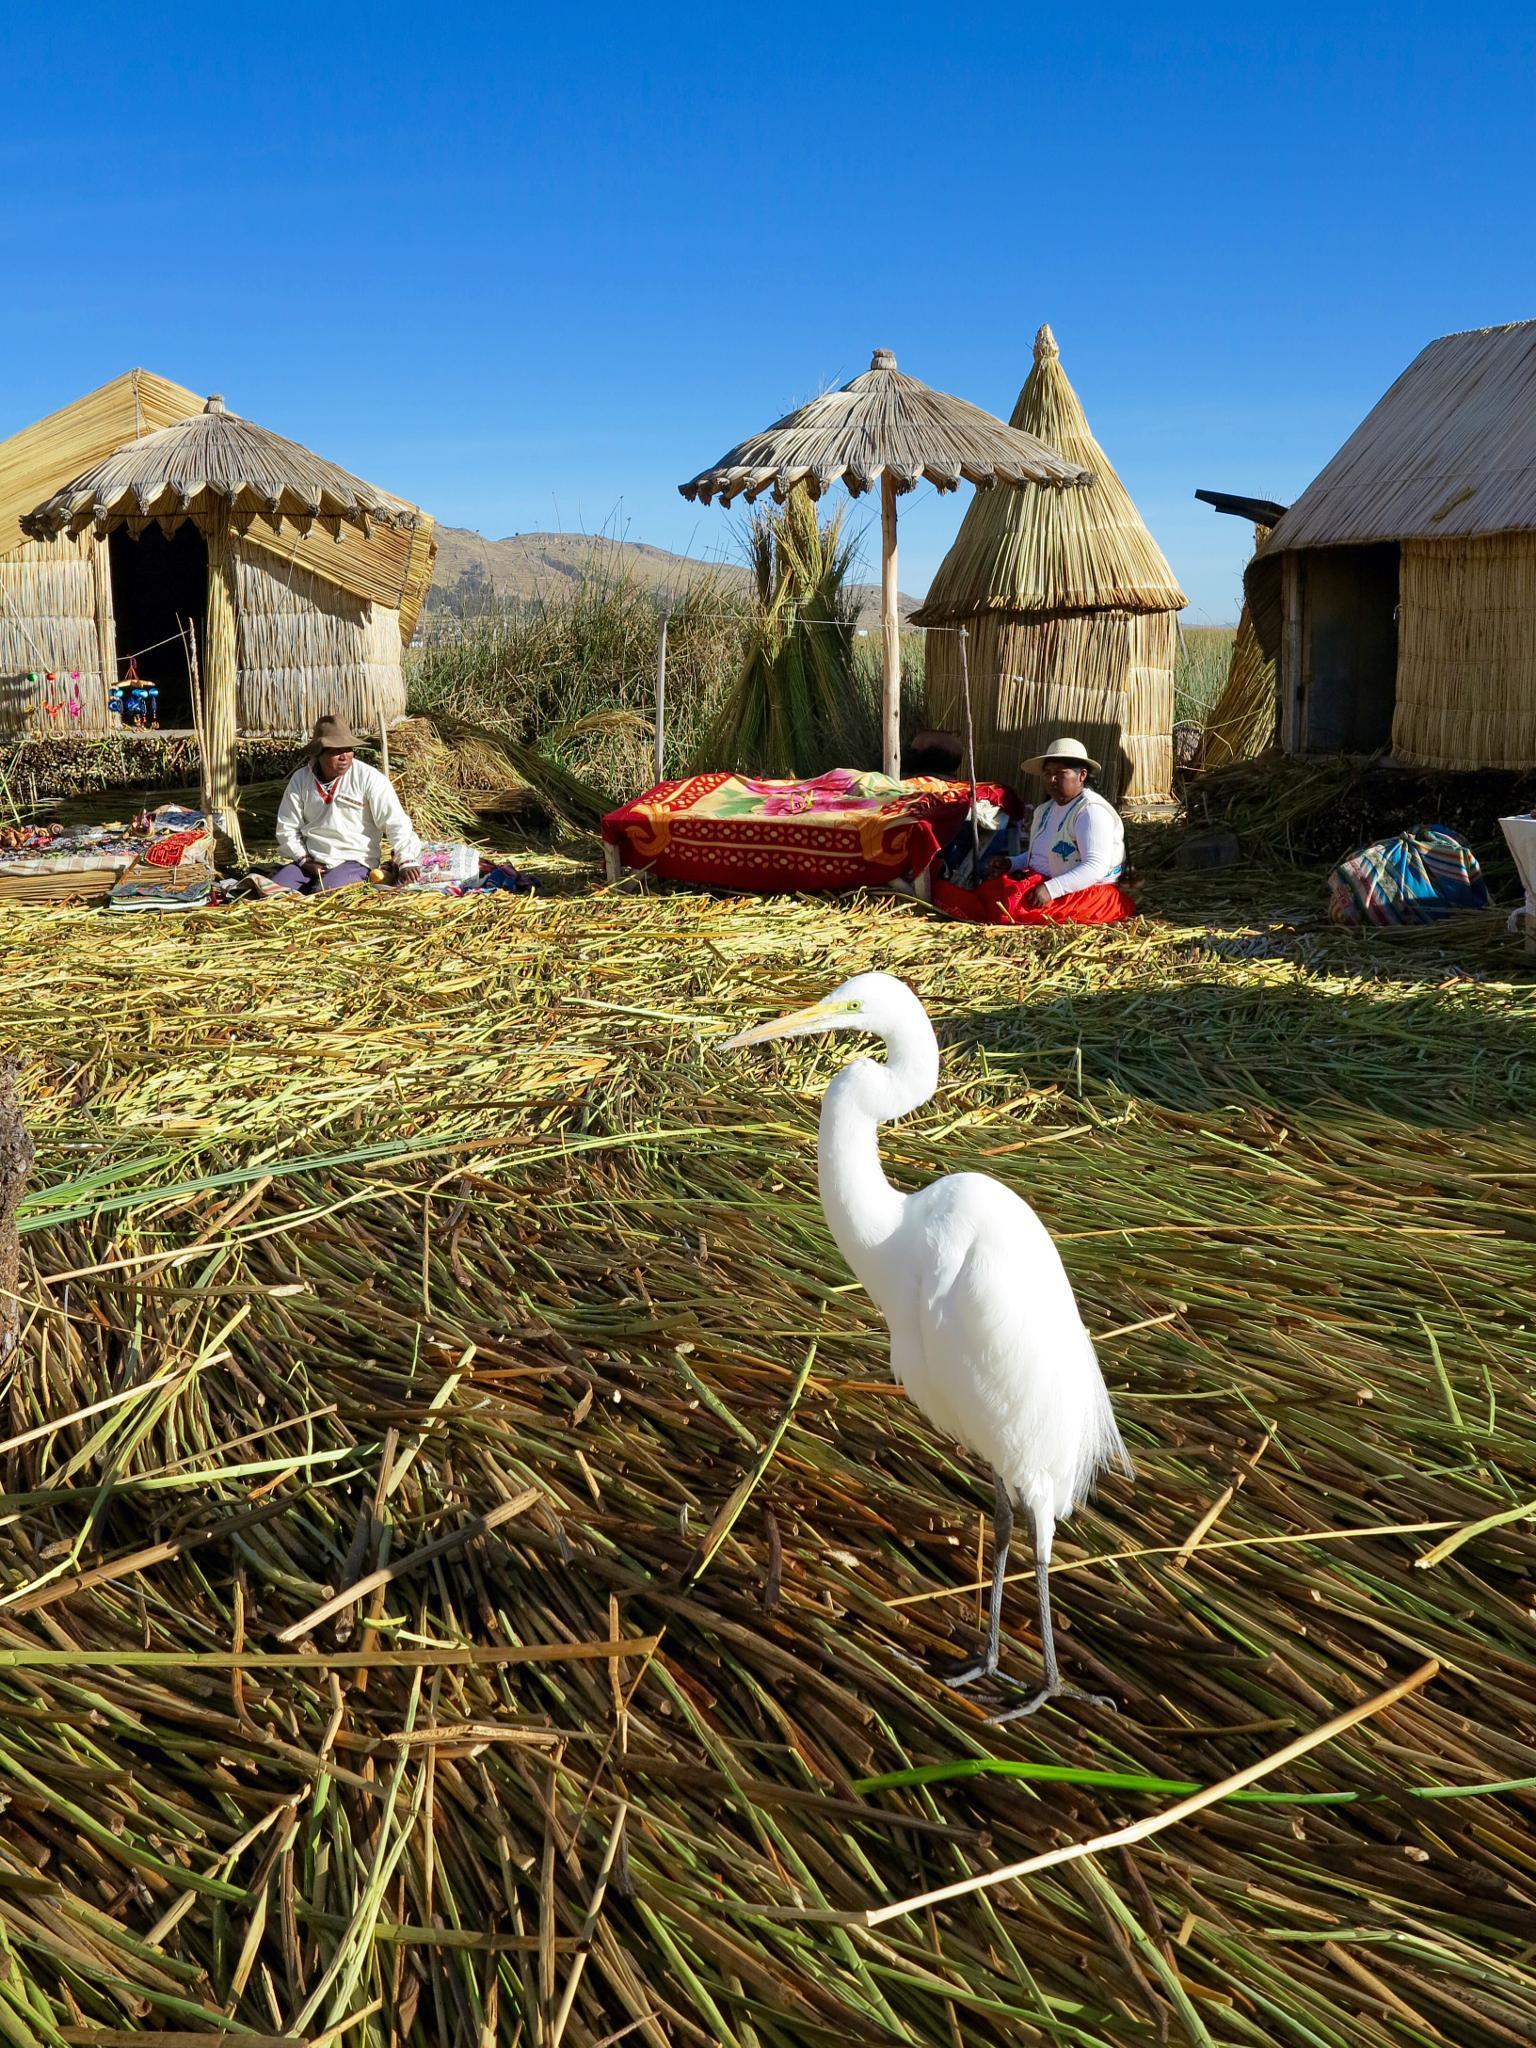 Visitor on floating island,Titicaca Lake,Peru by Adi Gli